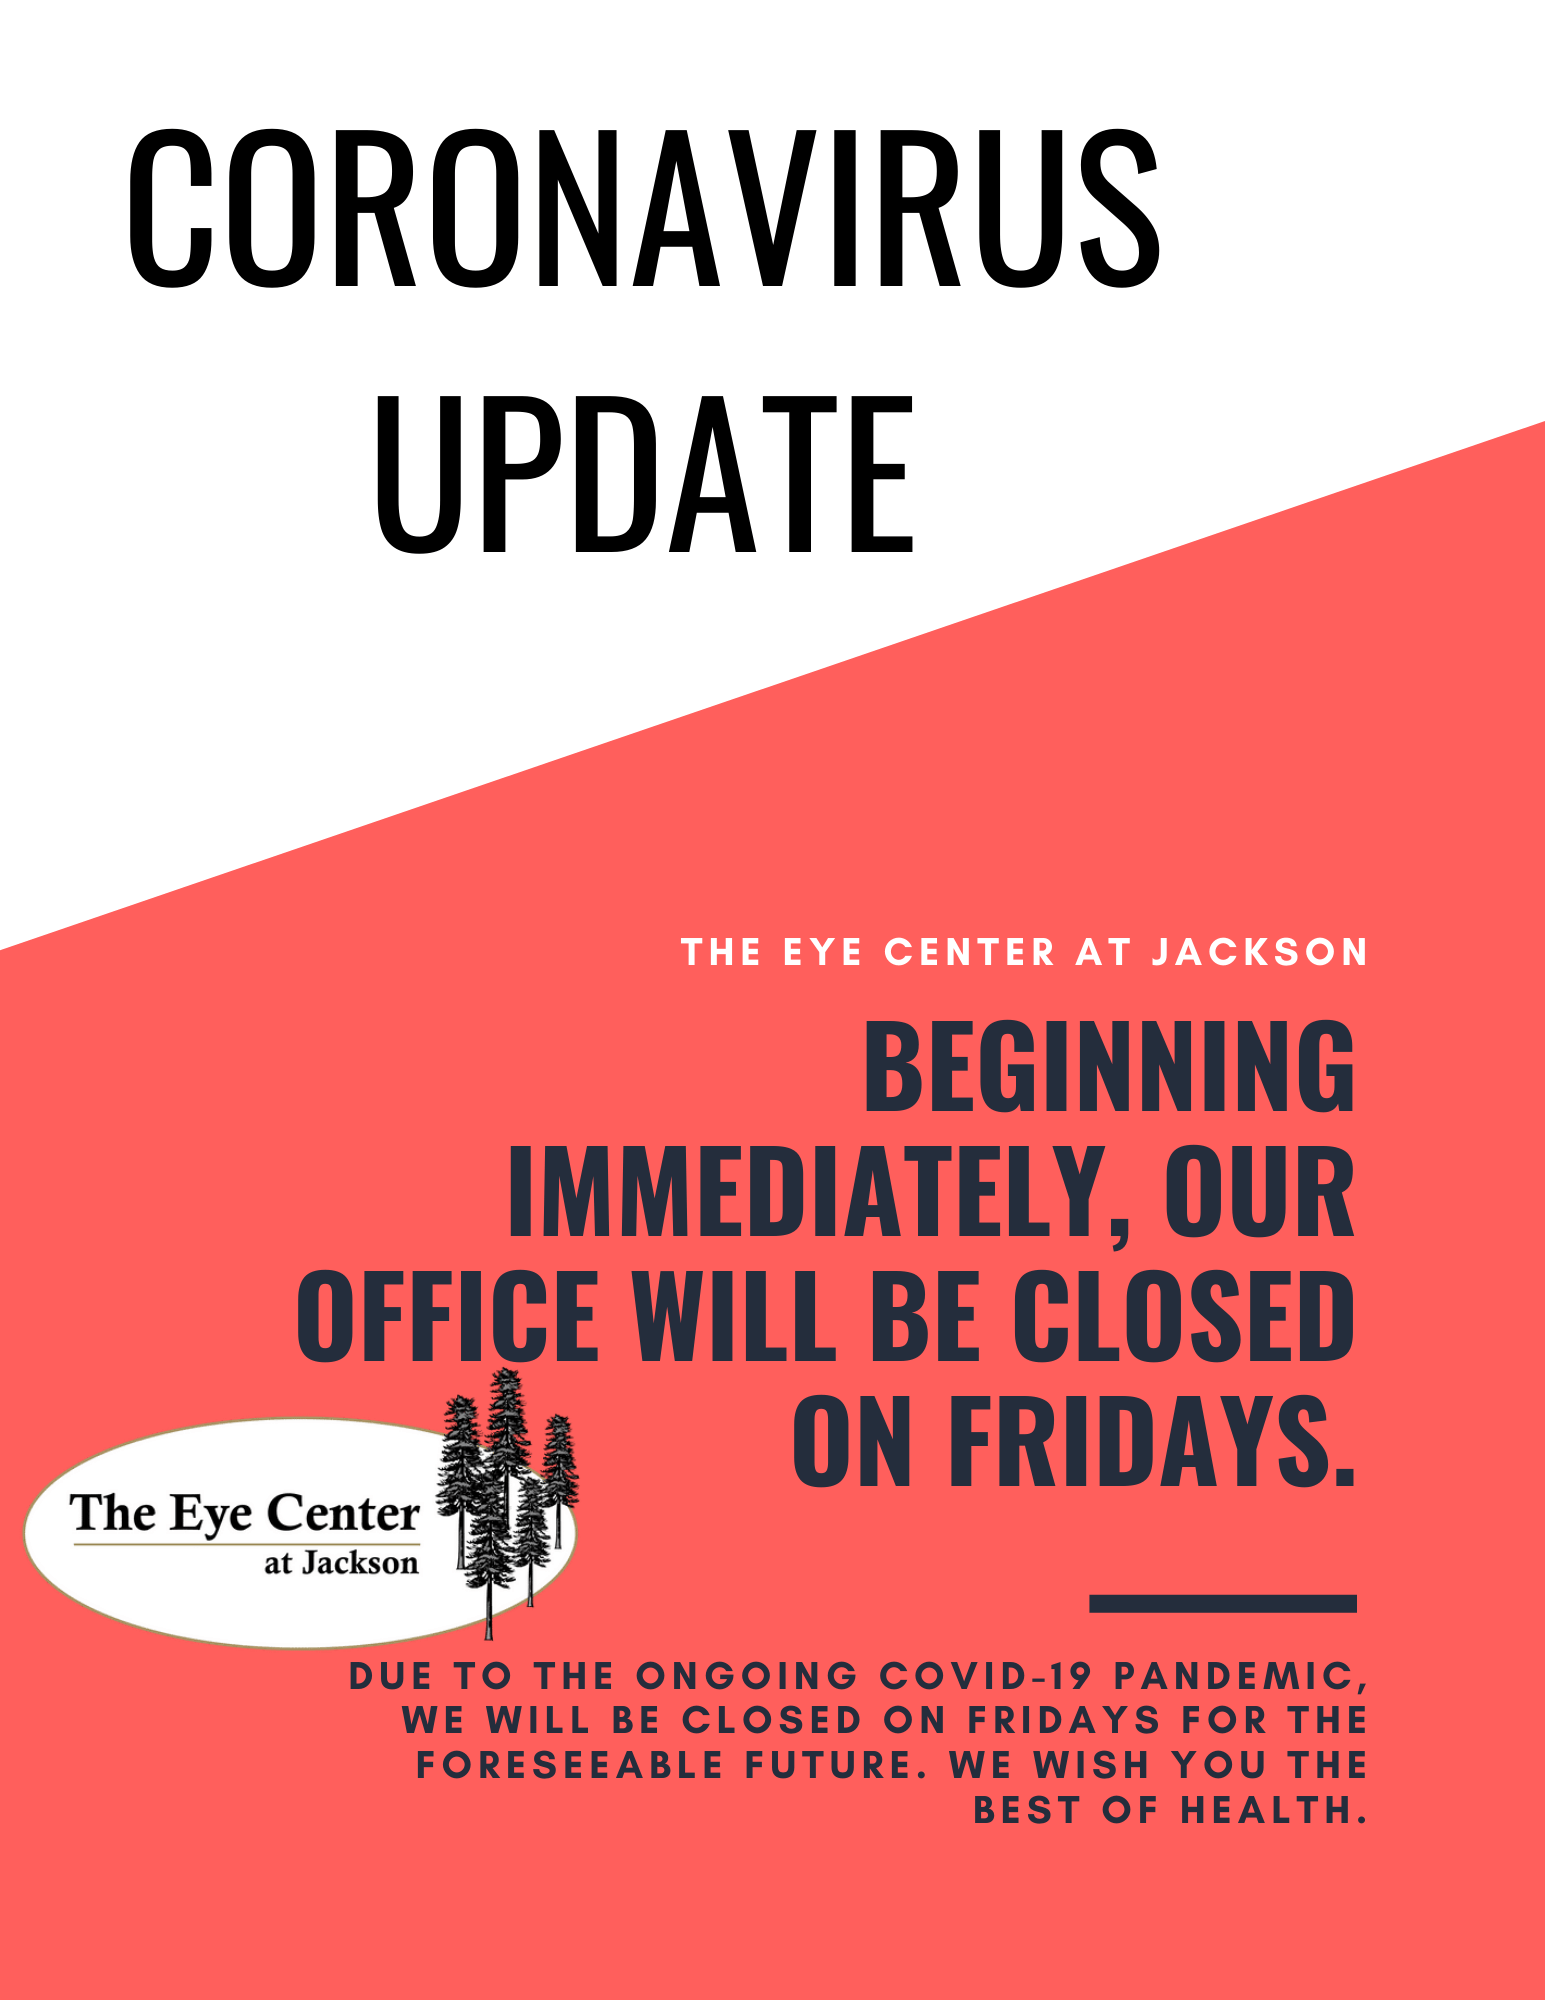 Friday Closures 2